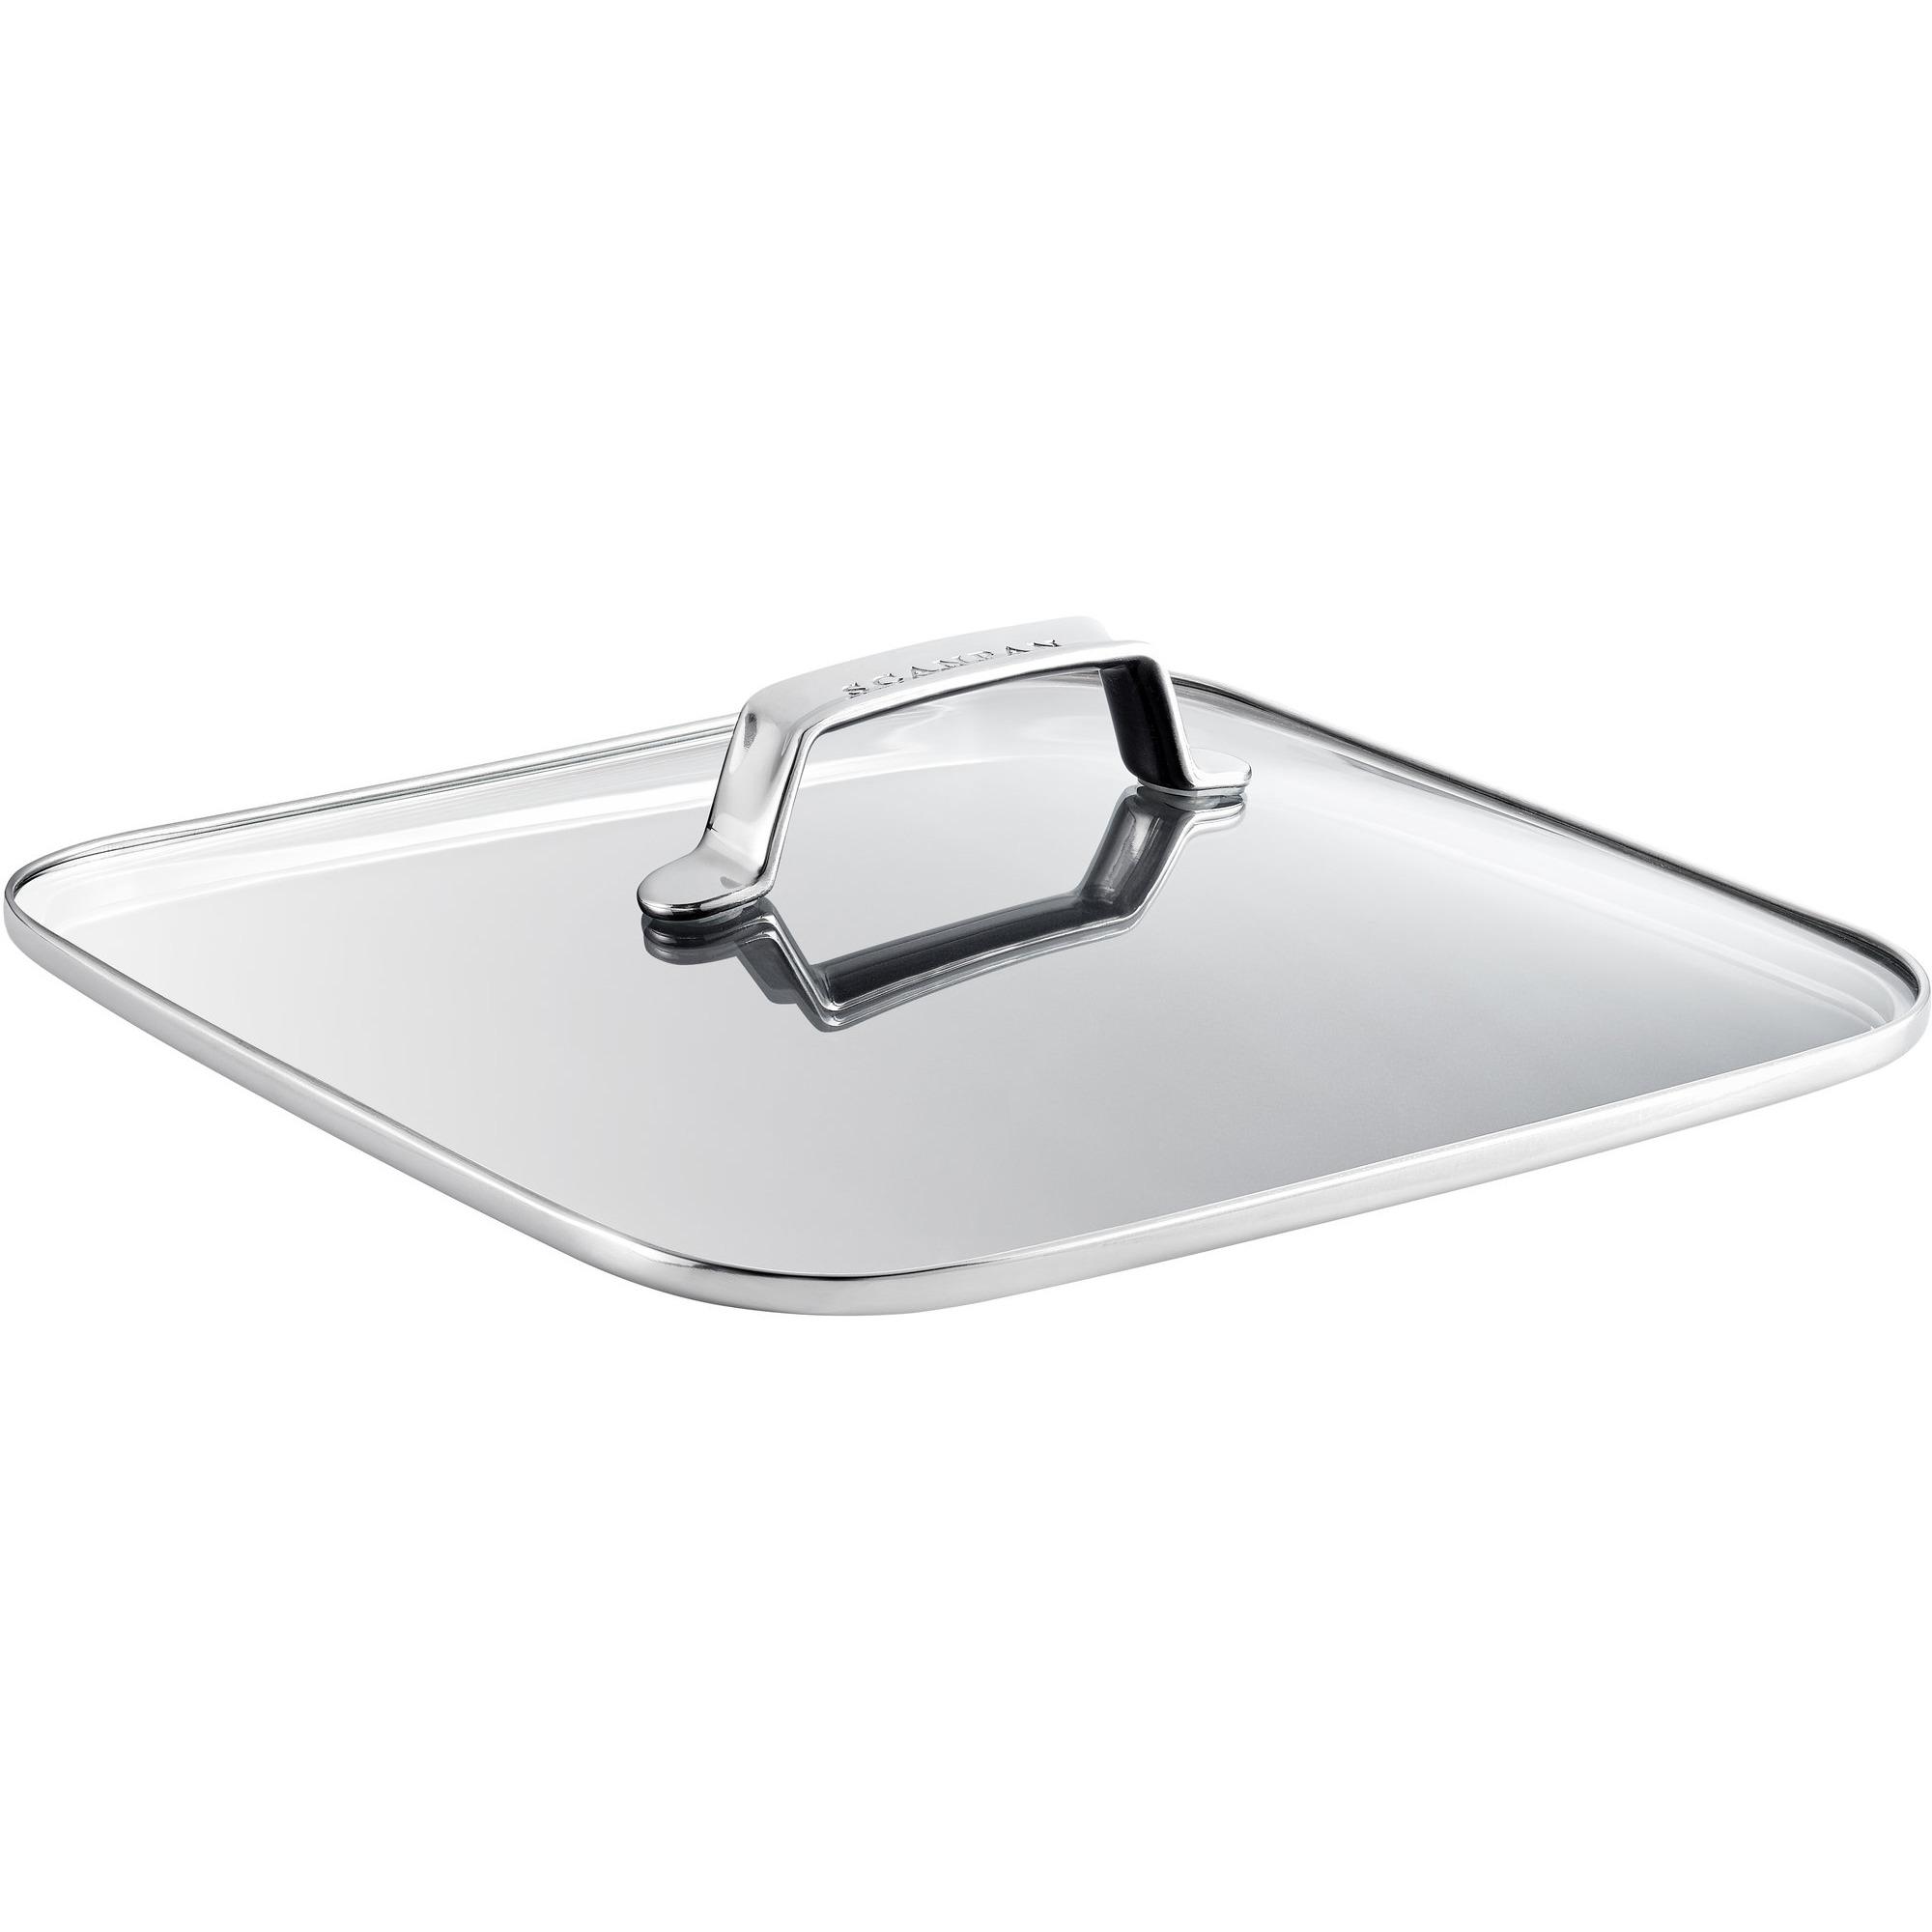 Scanpan TechnIQ Glaslock Fyrkantigt 28 cm